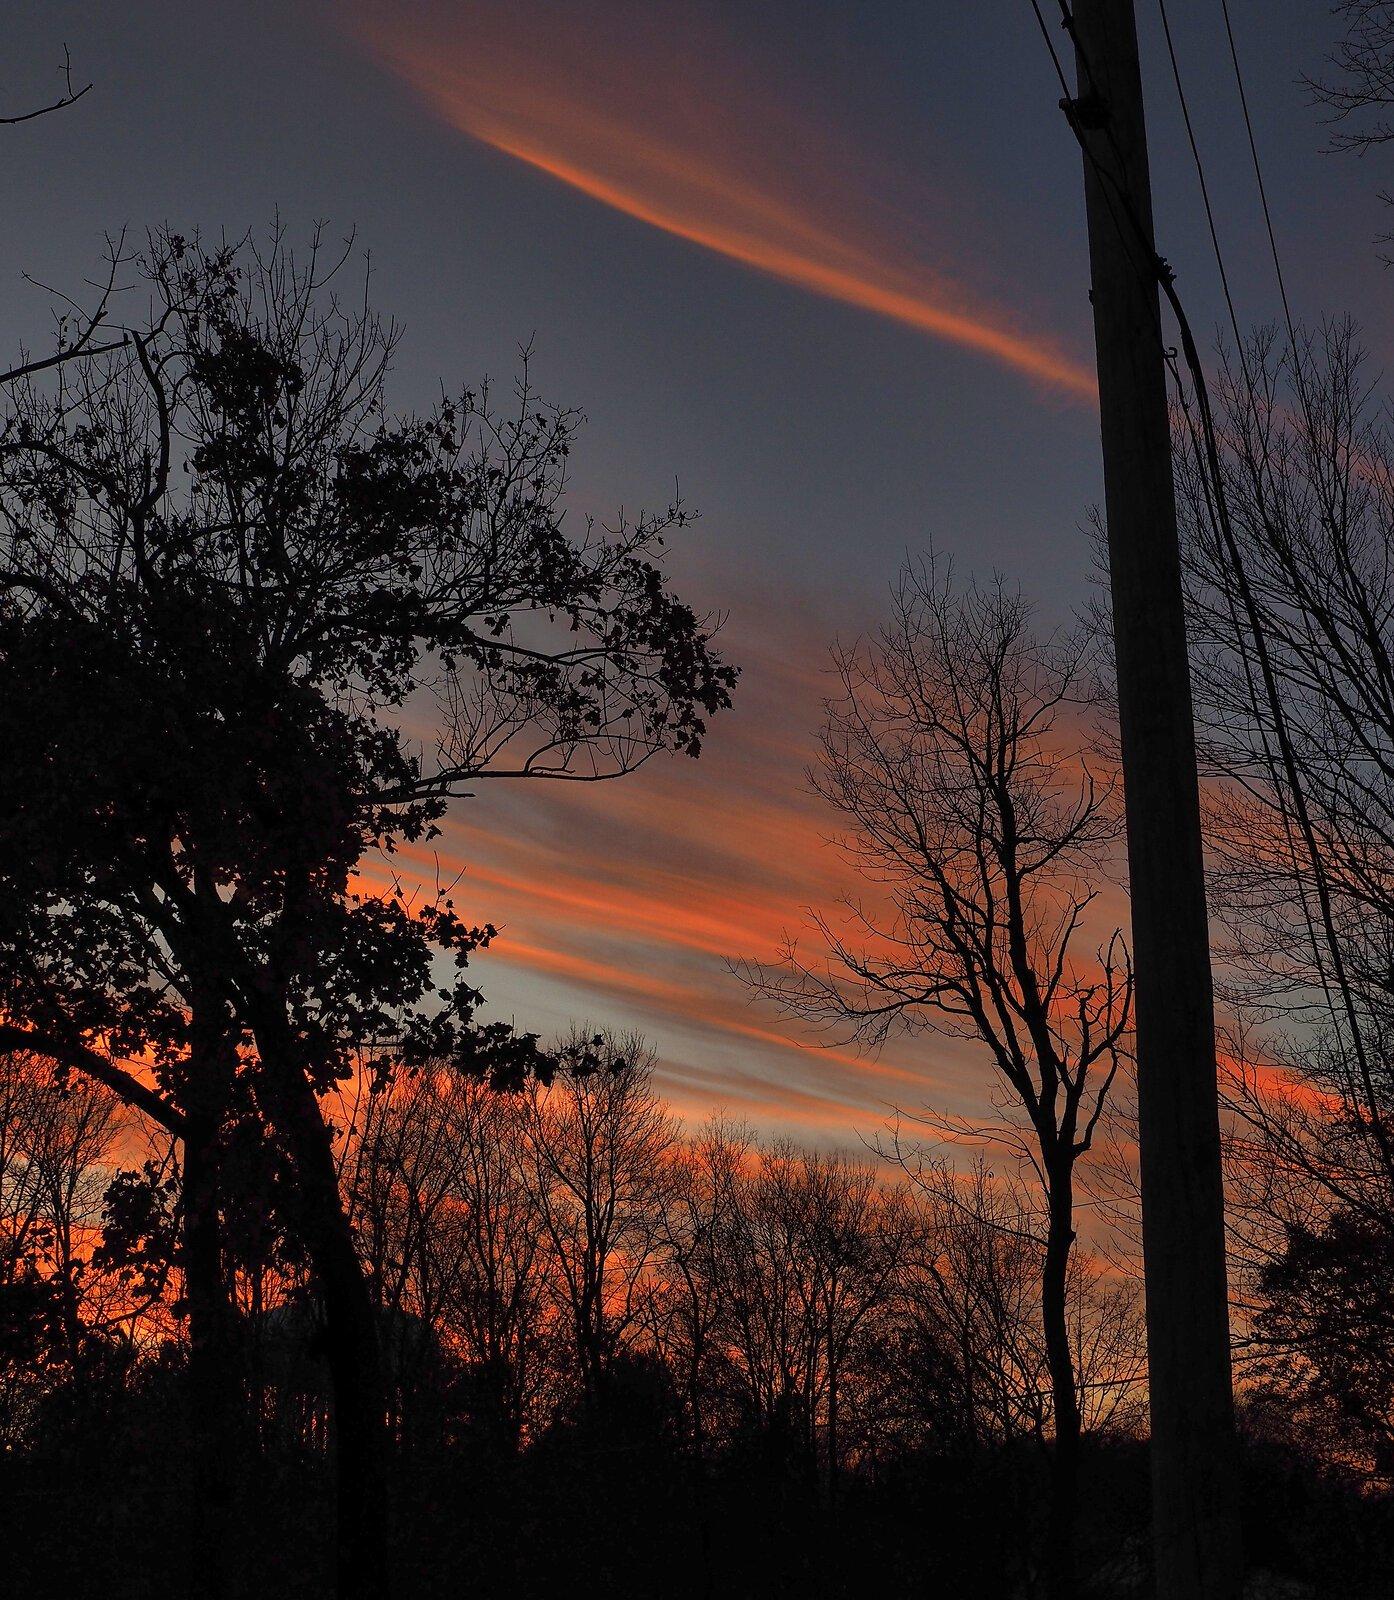 M1 gorgious sunset 011-001 B.jpg